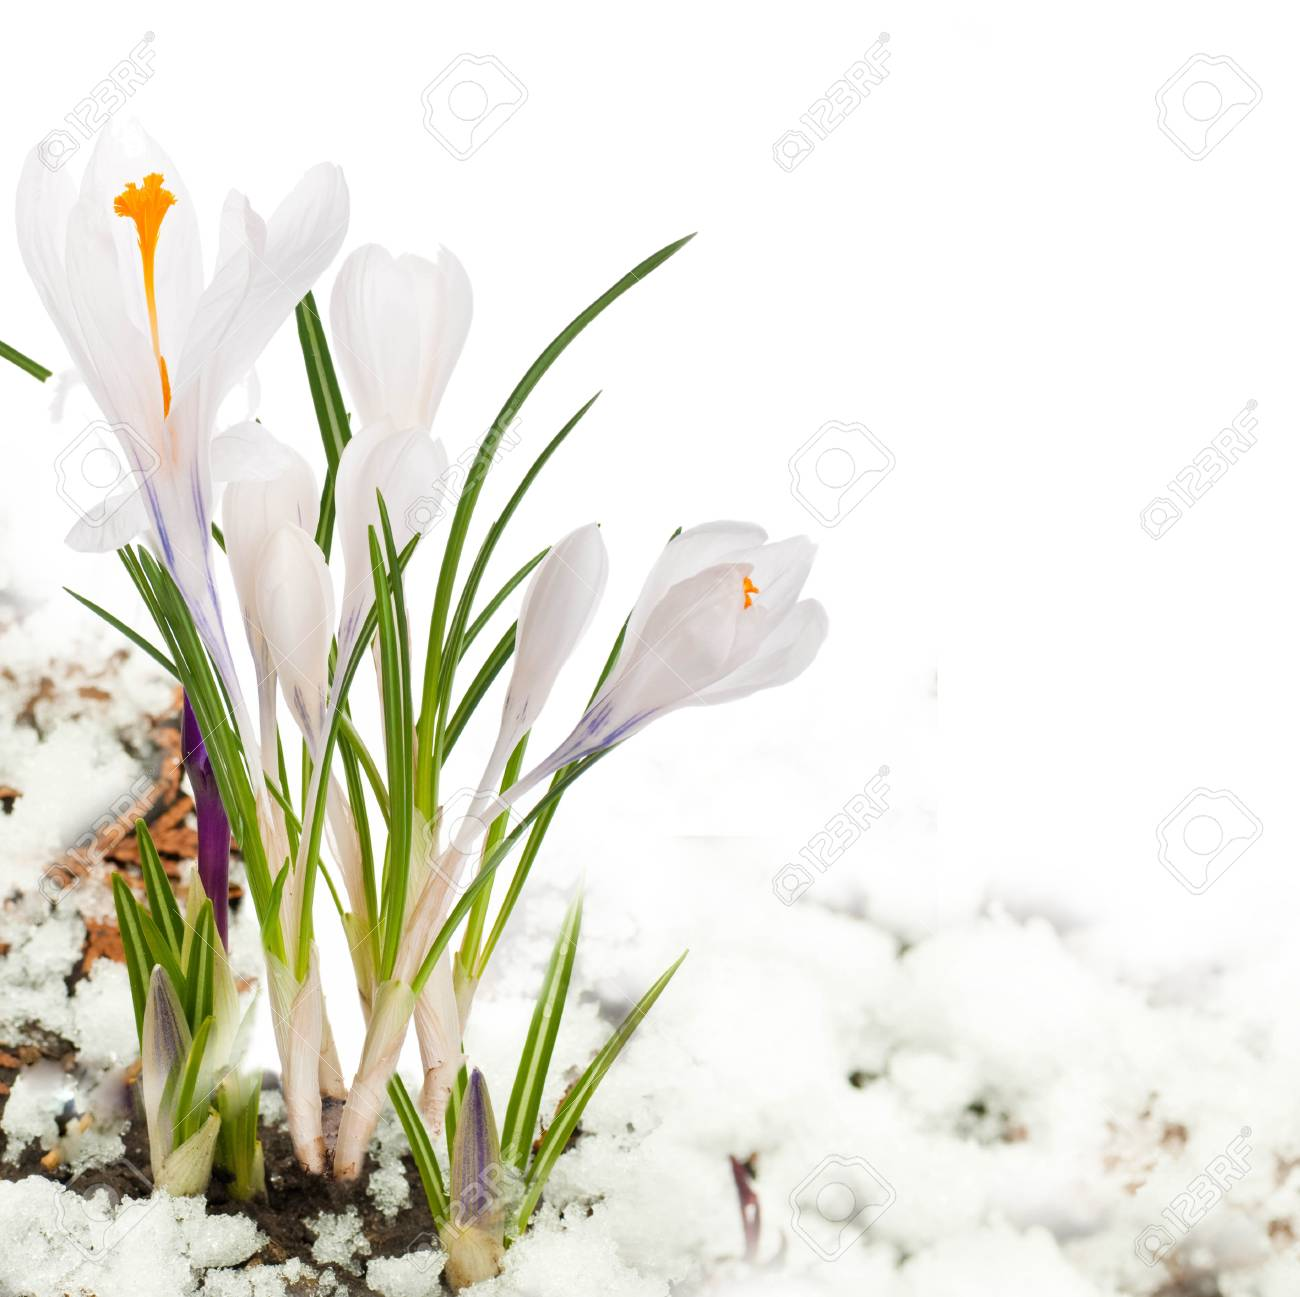 Fruhlingsblumen Weiss Dunkelblau Krokusse Gegen Schnee Lizenzfreie